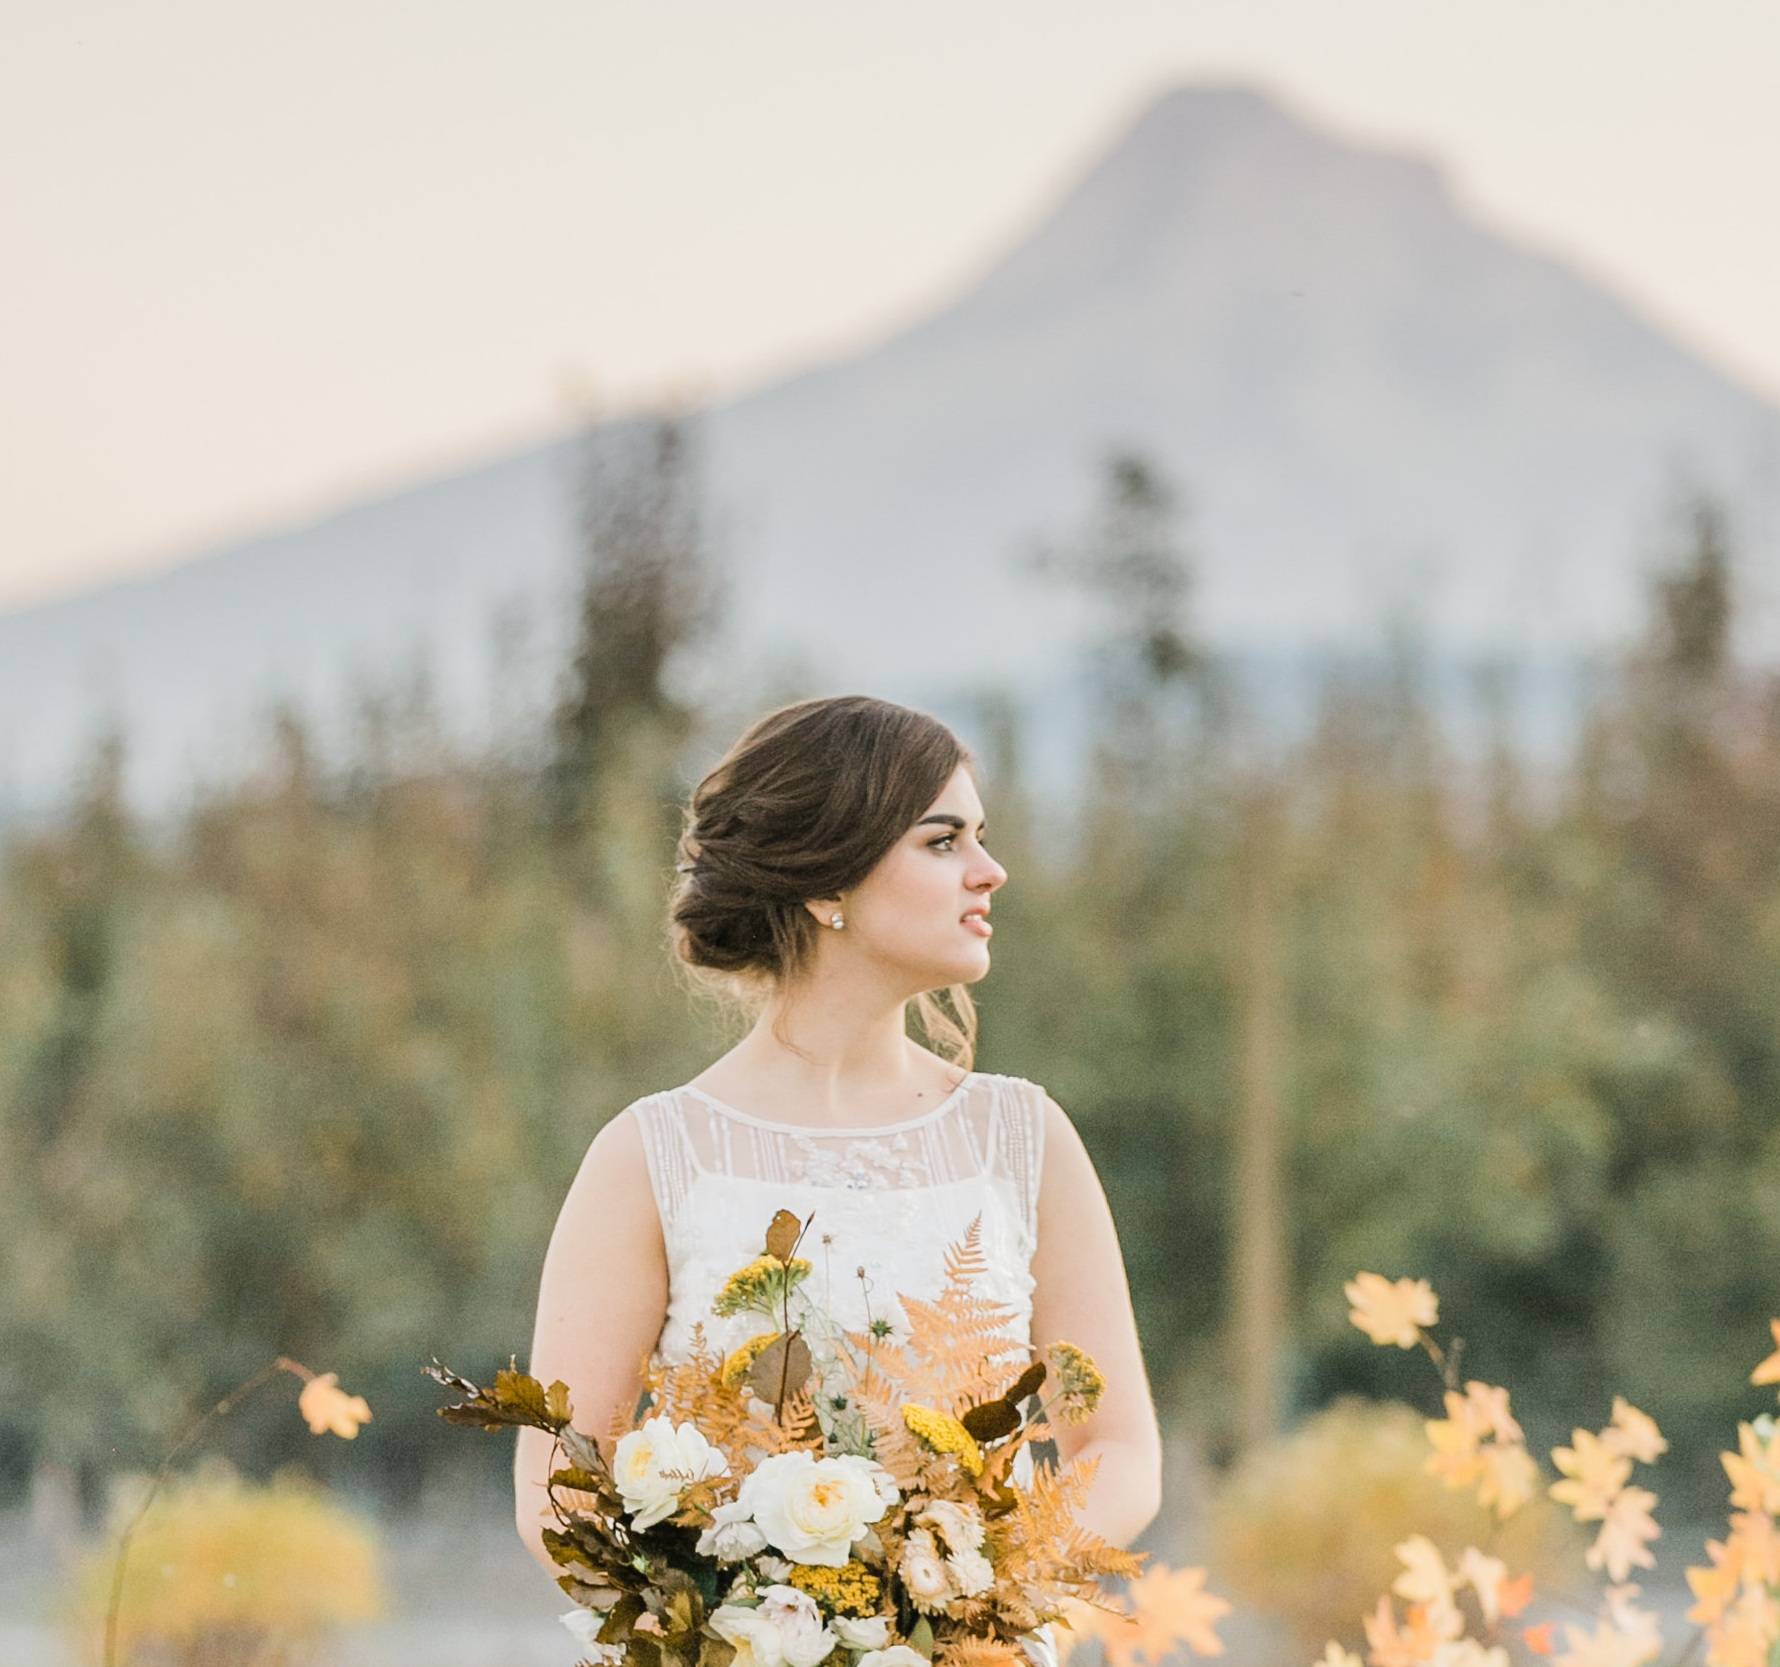 gina-neal-wedding-photography-the-orchard-112.jpg